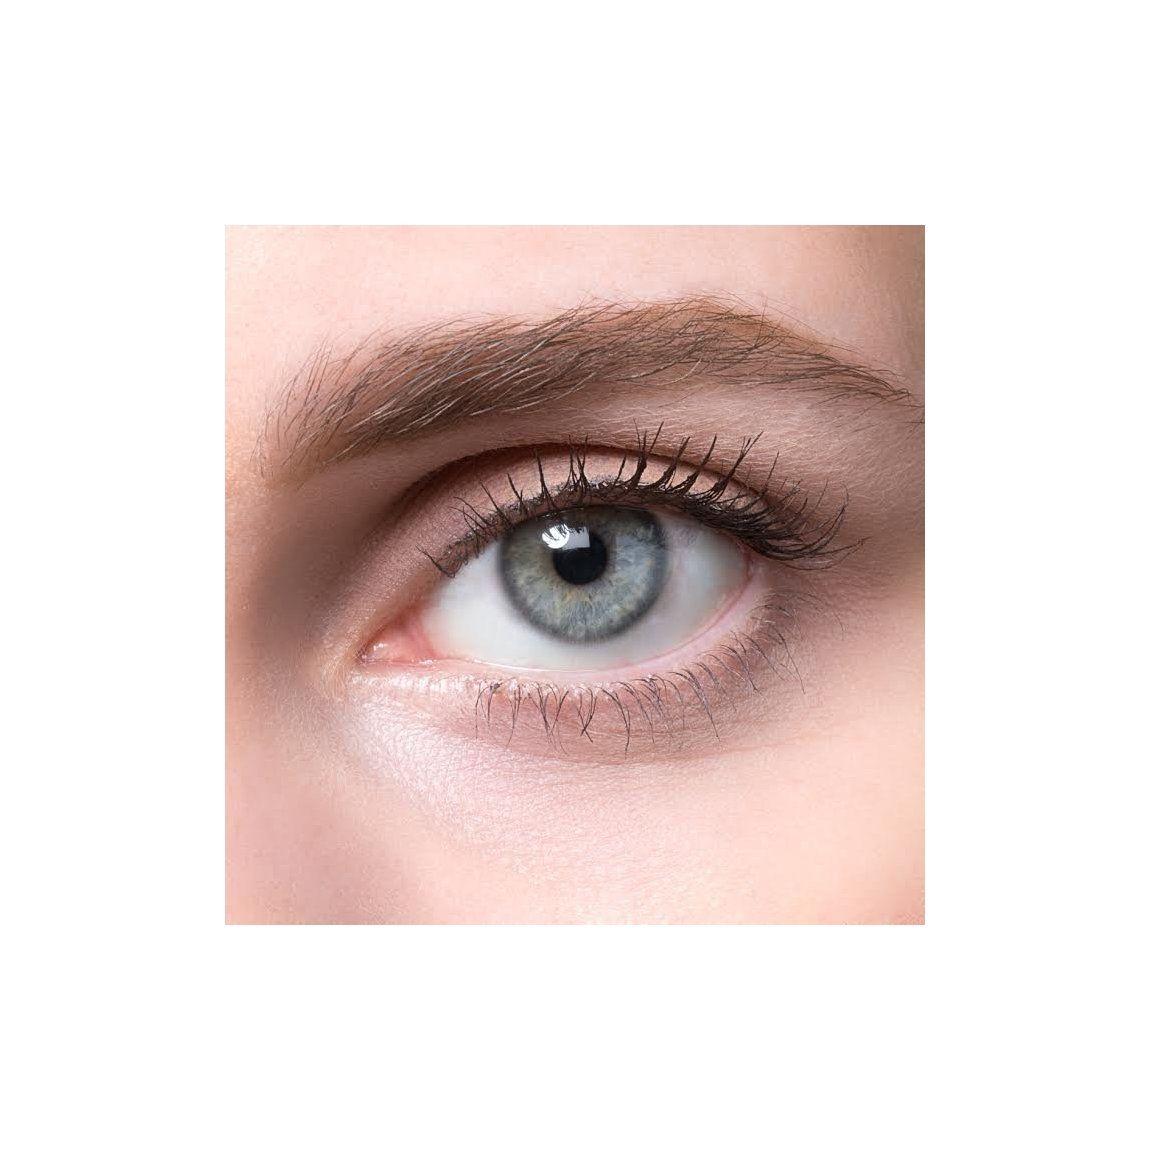 b72bfd0fda7 Mascara Terrybly Growth Booster Mascara | beautiful makeup | Mascara ...